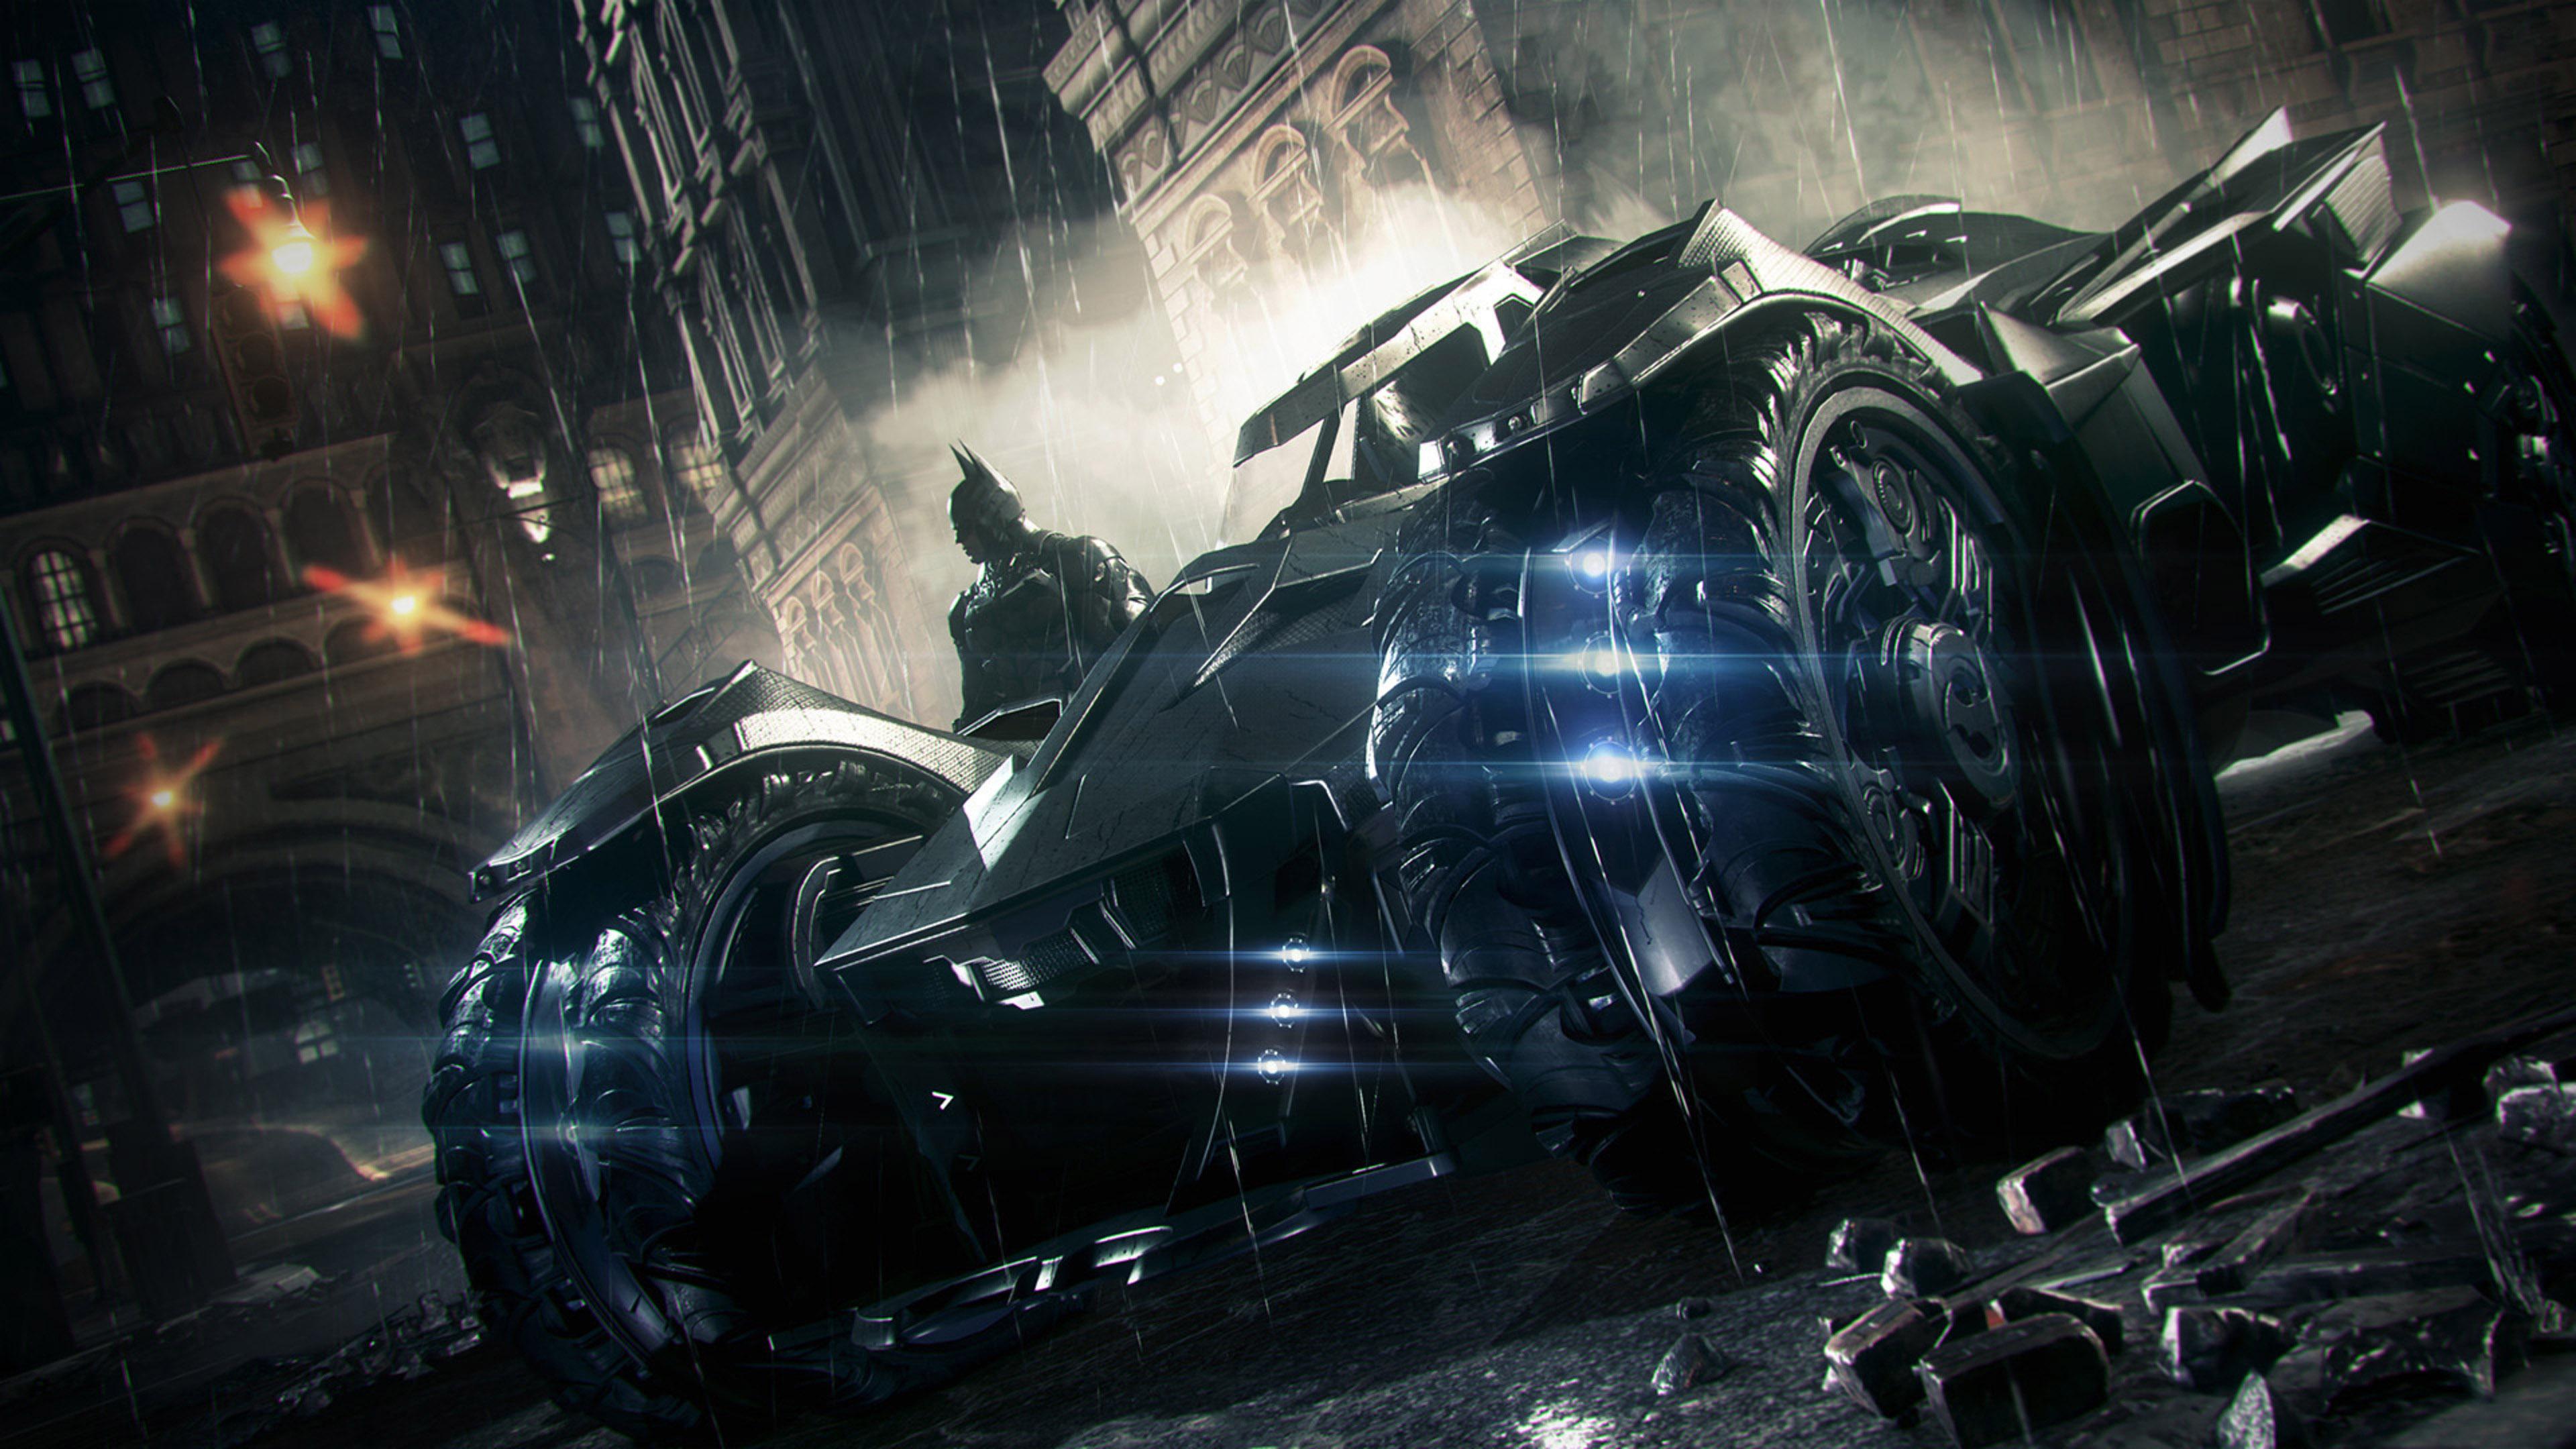 Download 2014 Batmobile Batman Arkham Knight HD Wallpapers 6470 Full 3840x2160